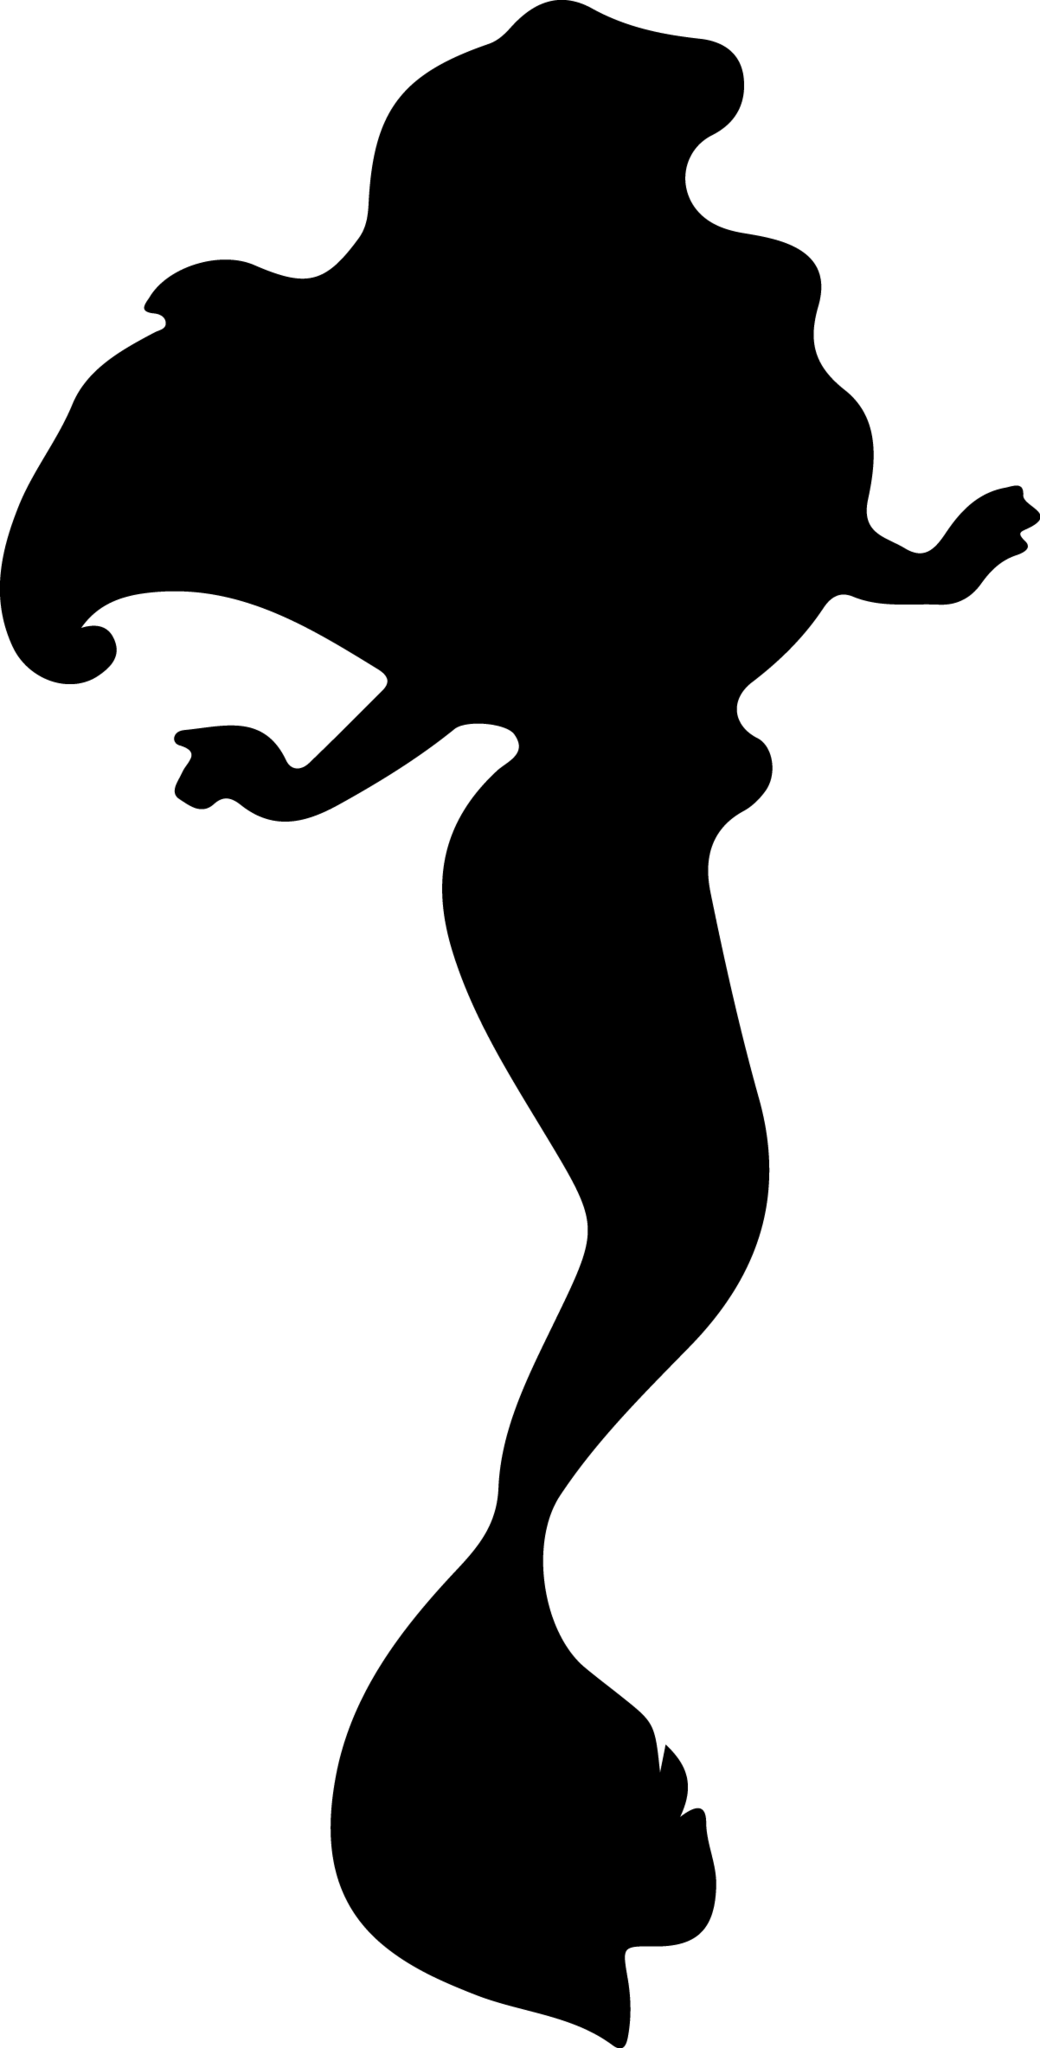 Jpg Disney Ariel Shadow Clipart Clipground